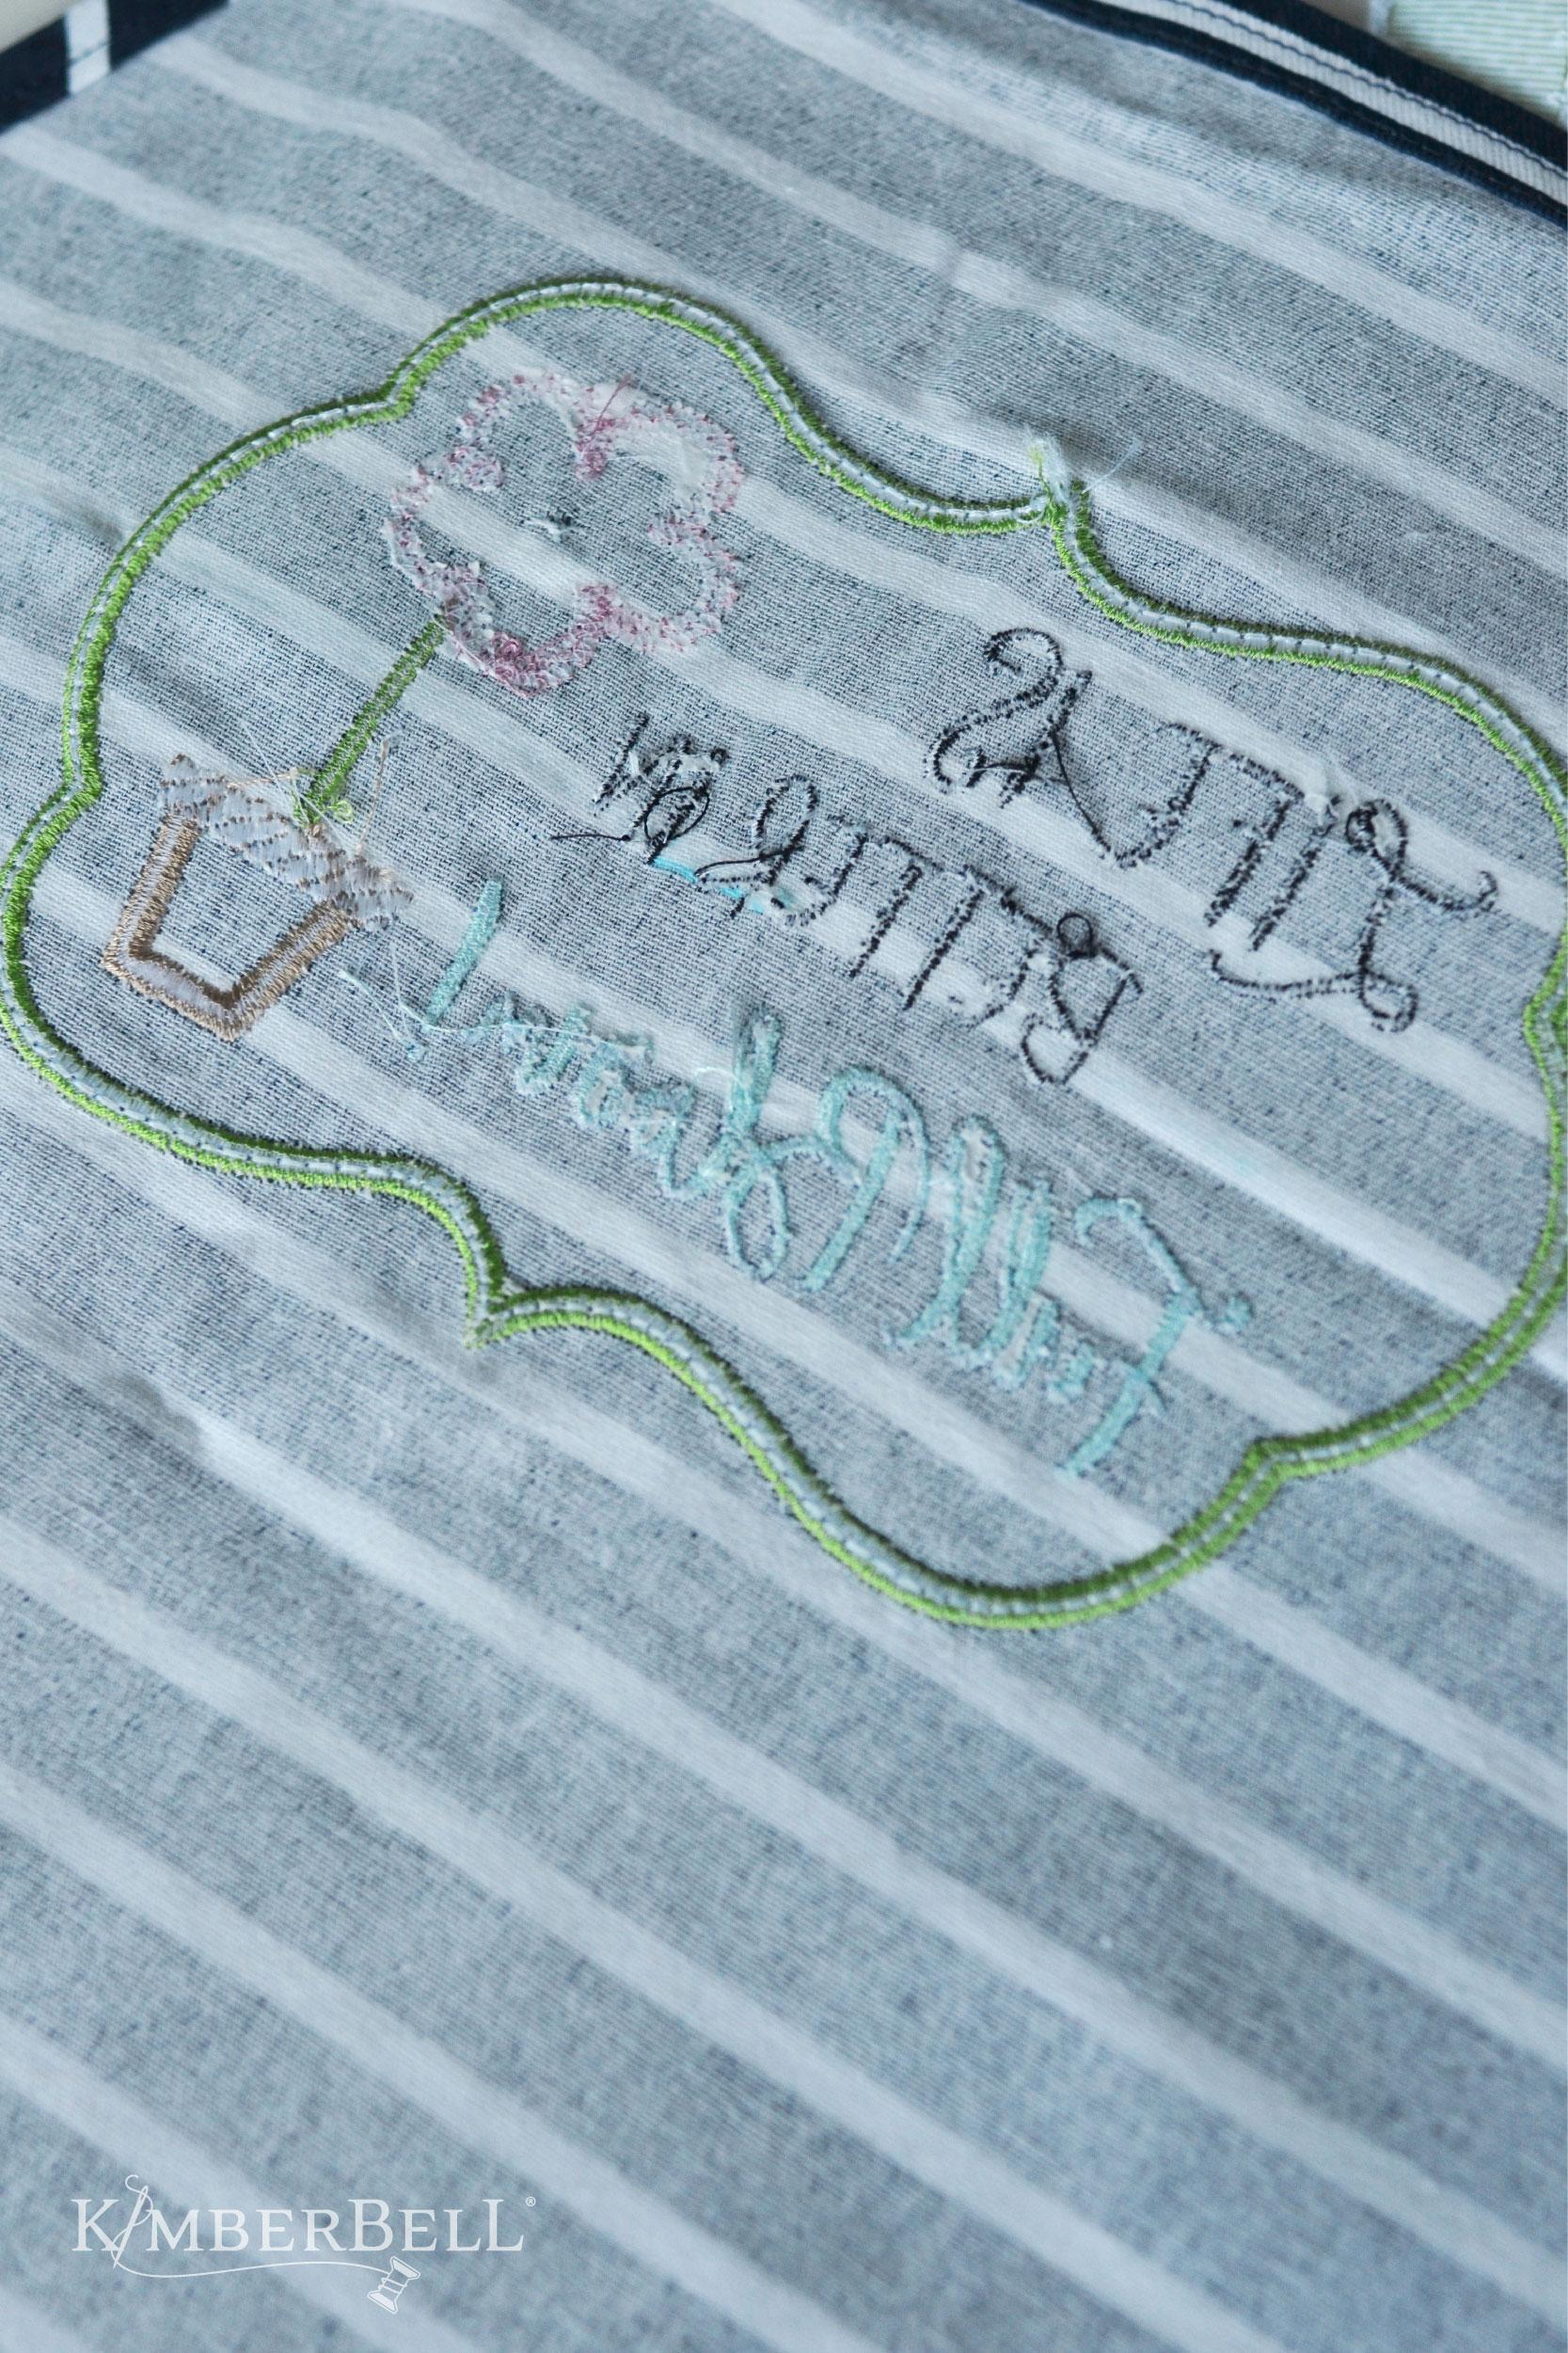 Kimberbell Tear-Away Machine Embroidery Stabilizer